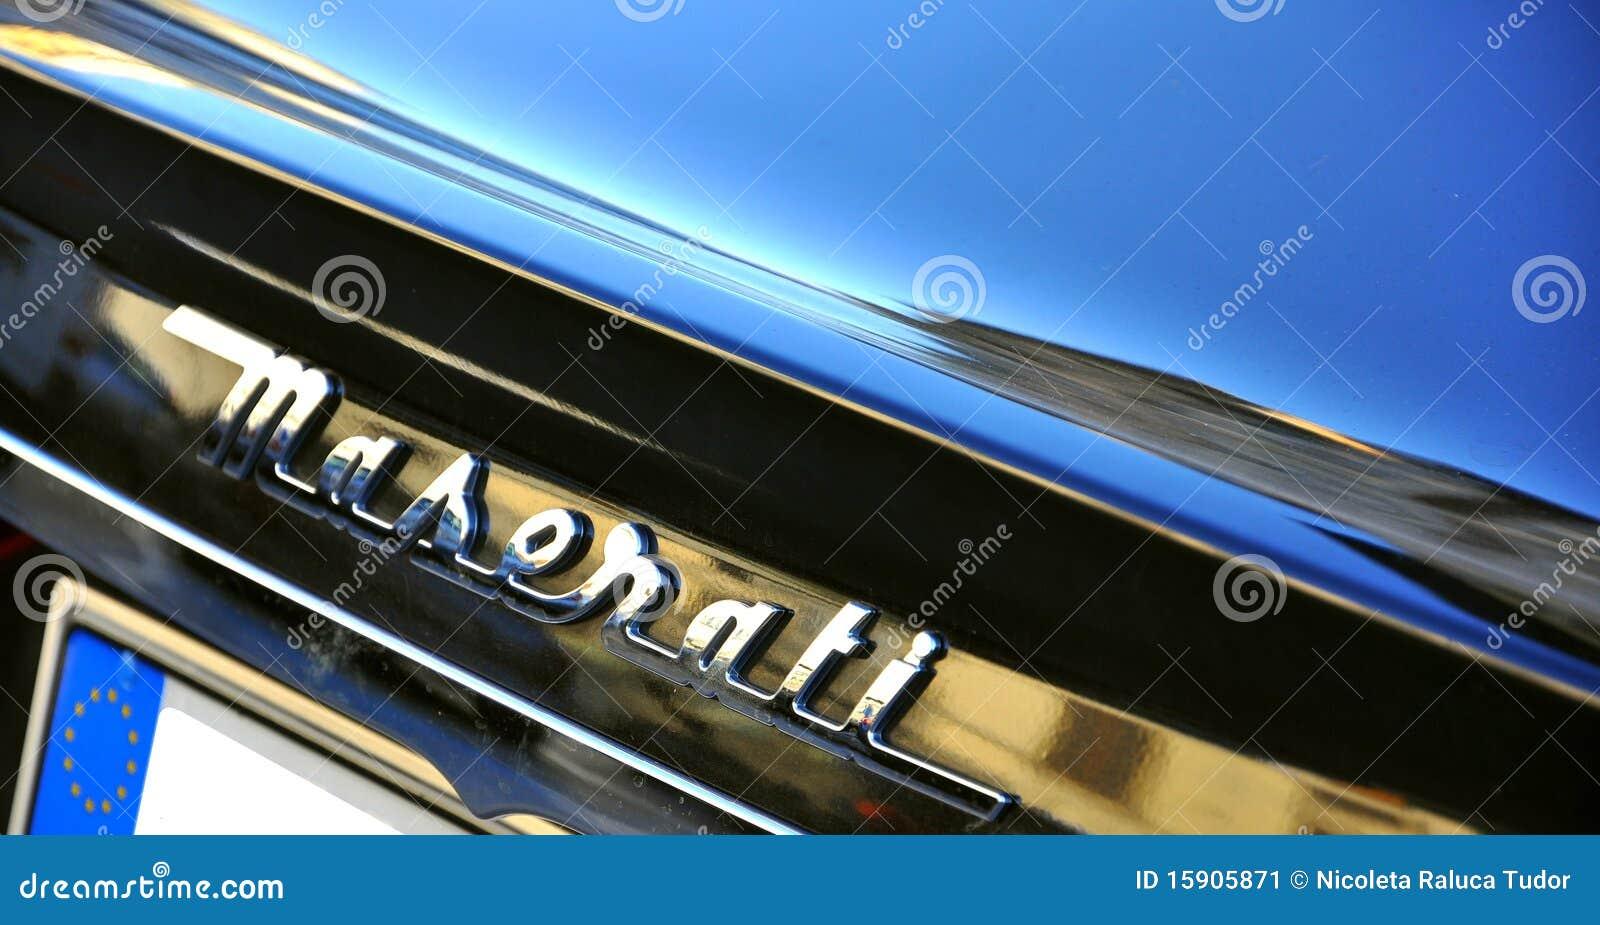 Displaying 16> Images For - Italian Car Manufacturer Logos...